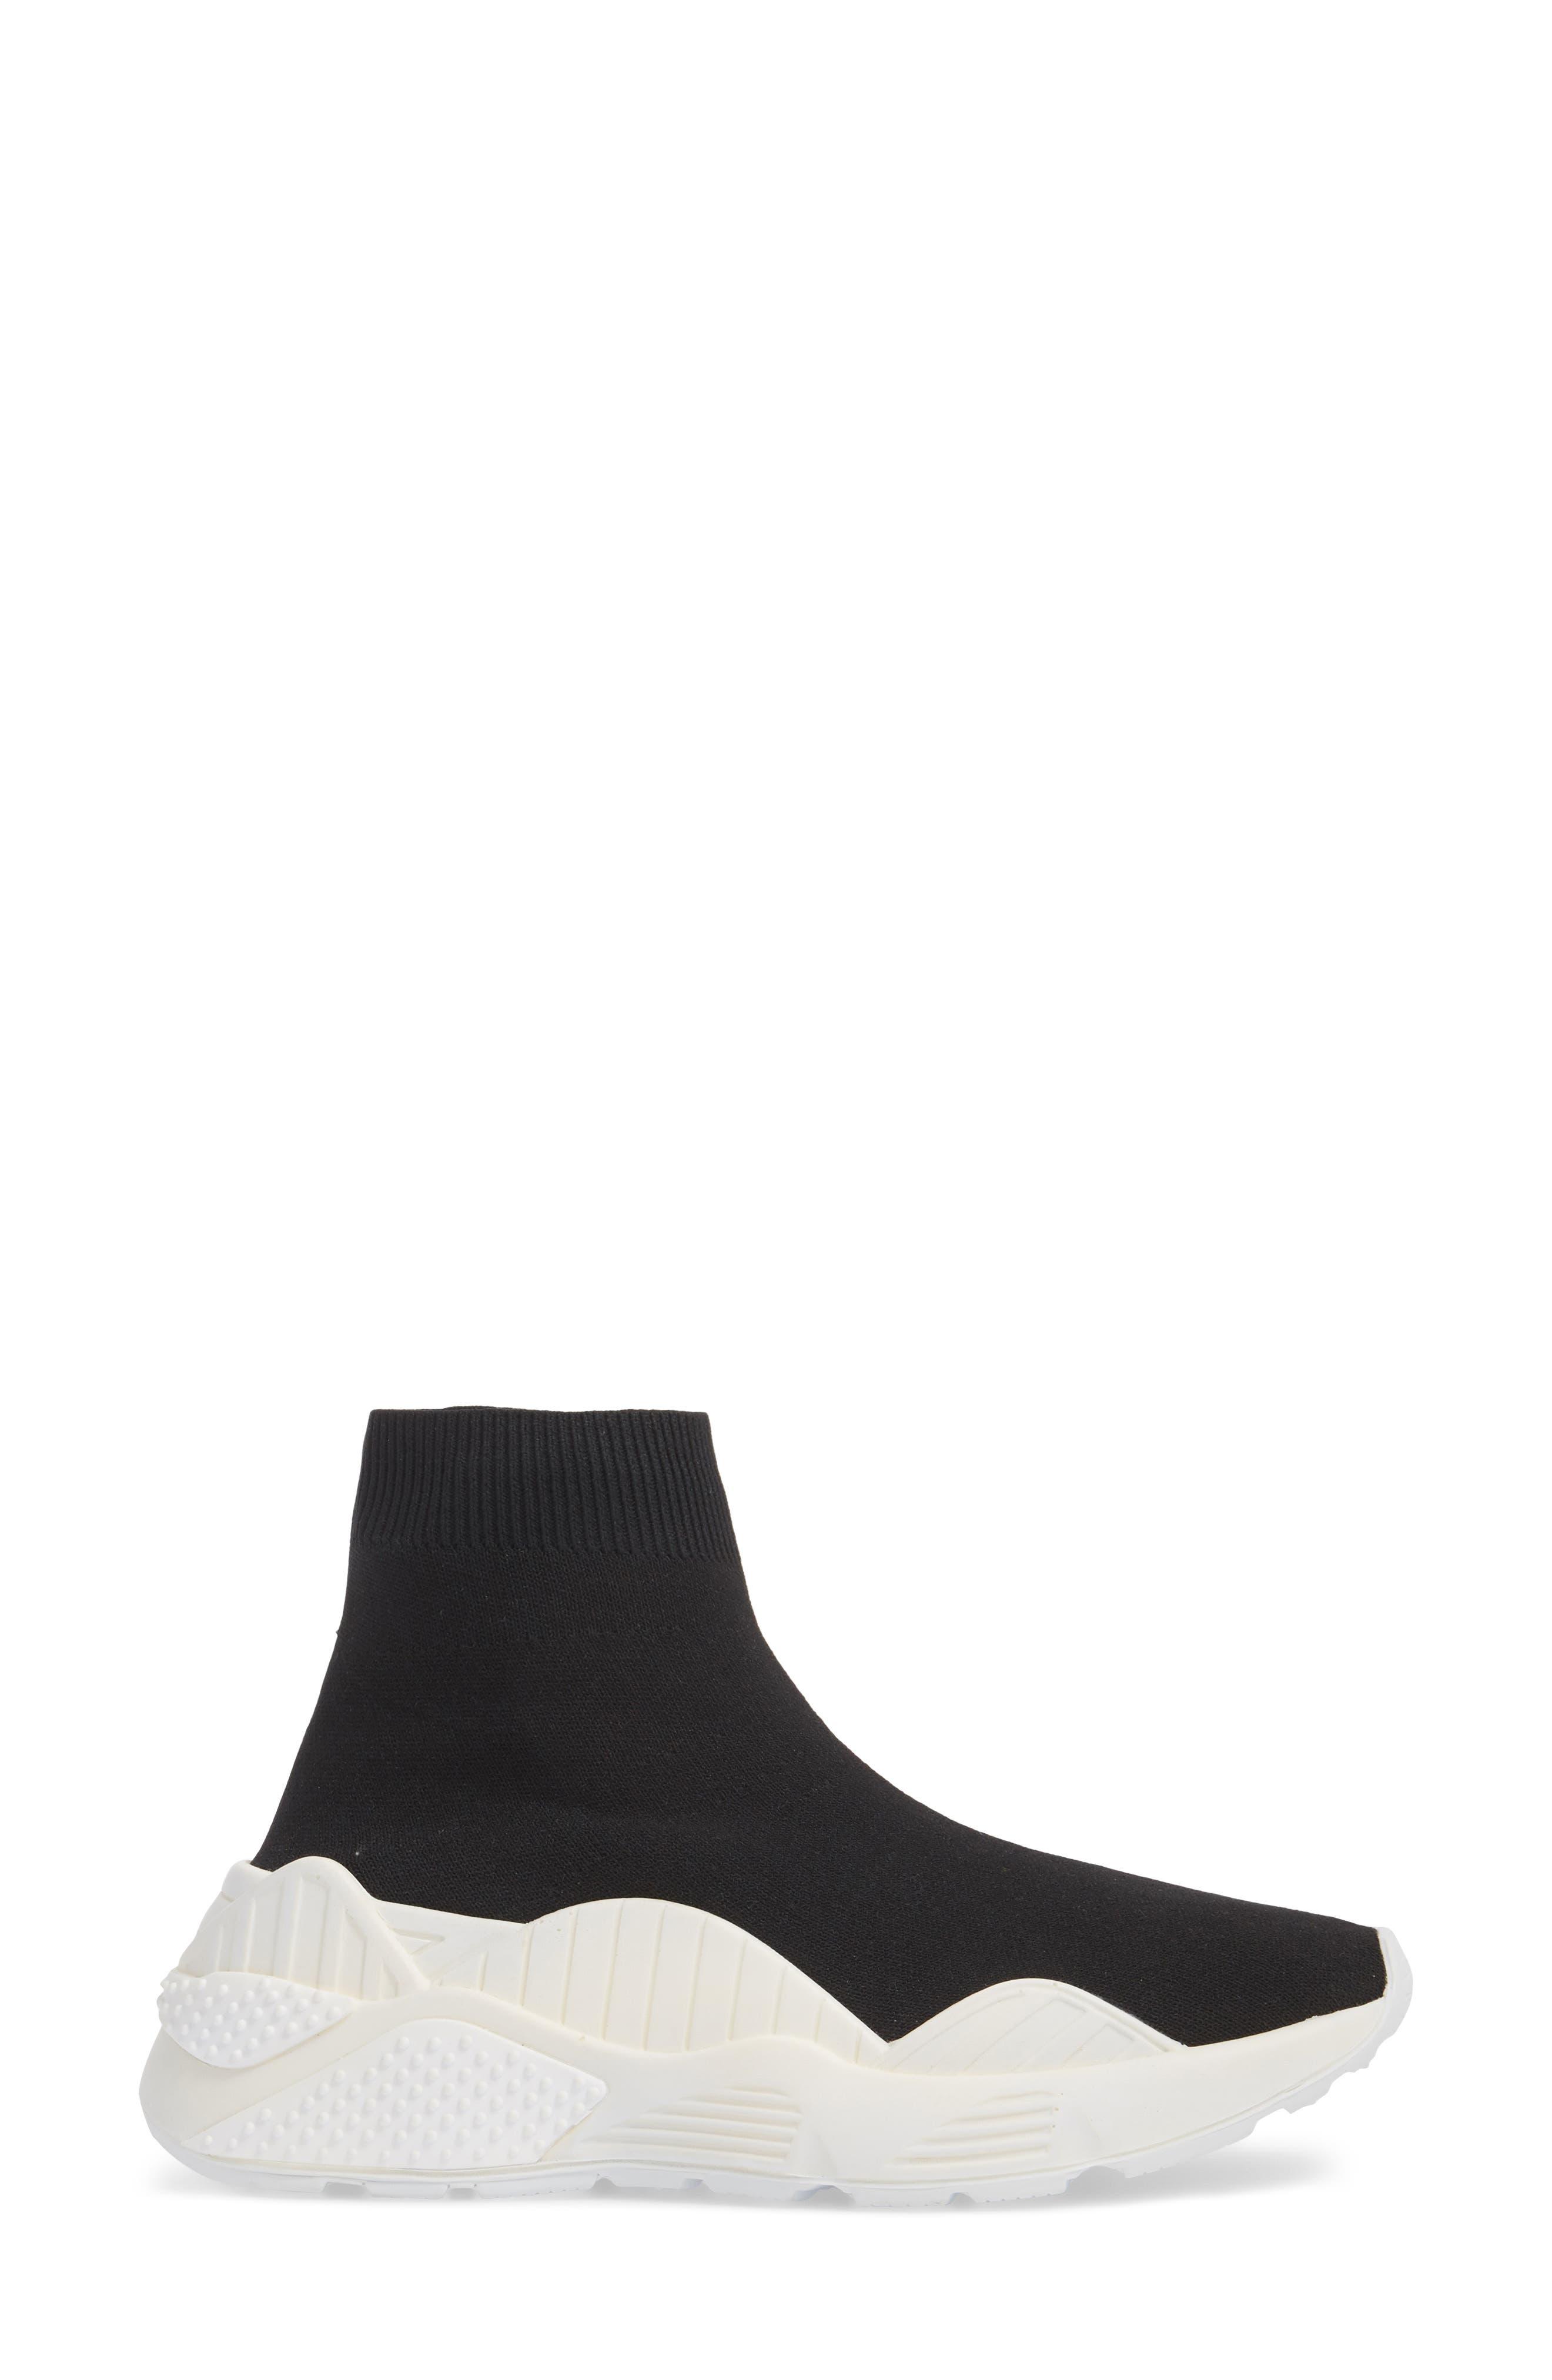 Lunix Sock Sneaker,                             Alternate thumbnail 3, color,                             014